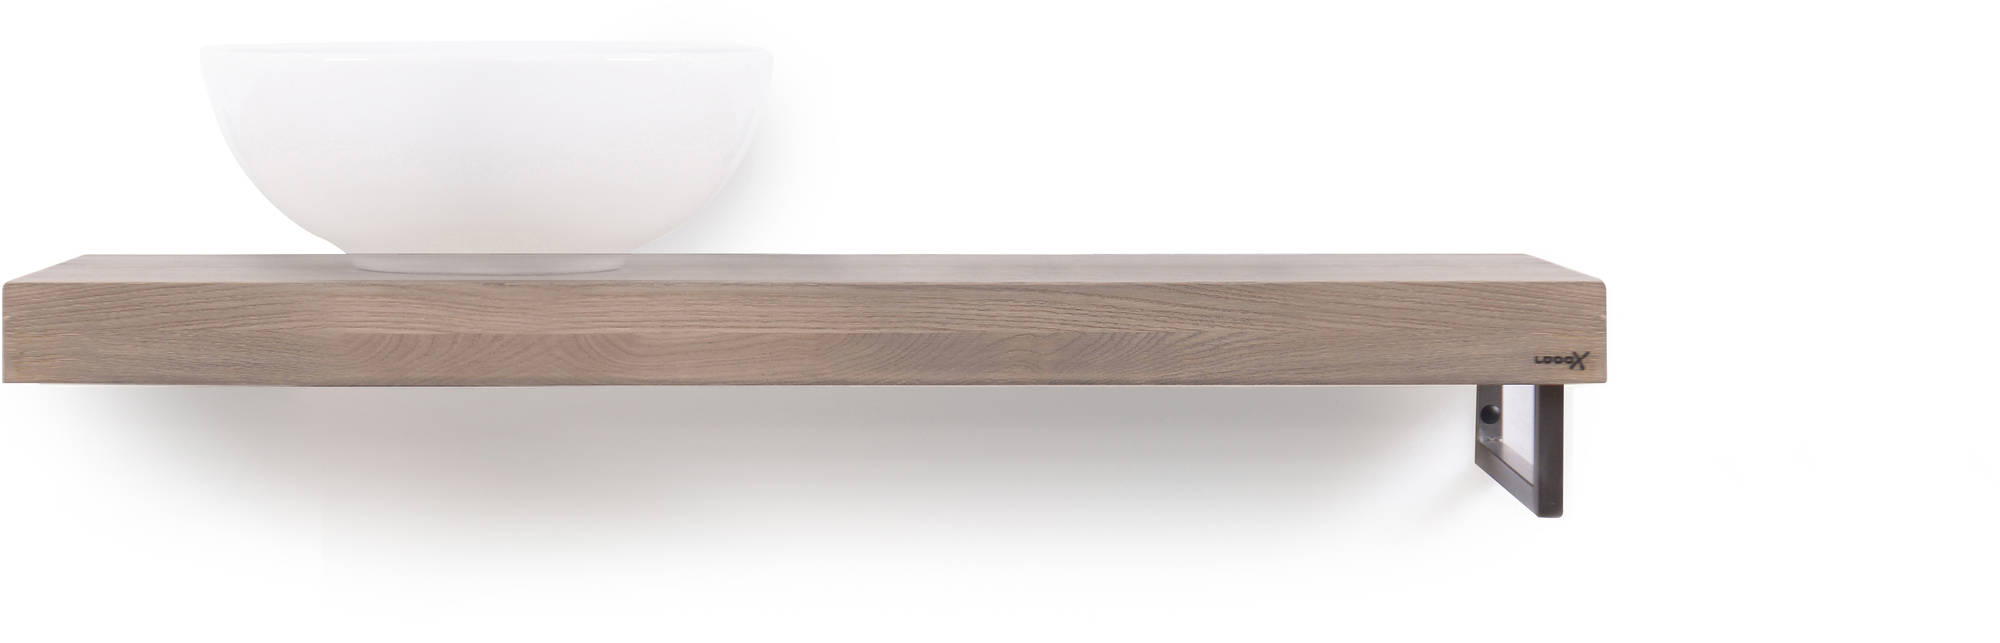 Looox Wooden Base Shelf Solo 100 cm Houder Rechts Old Grey/RVS